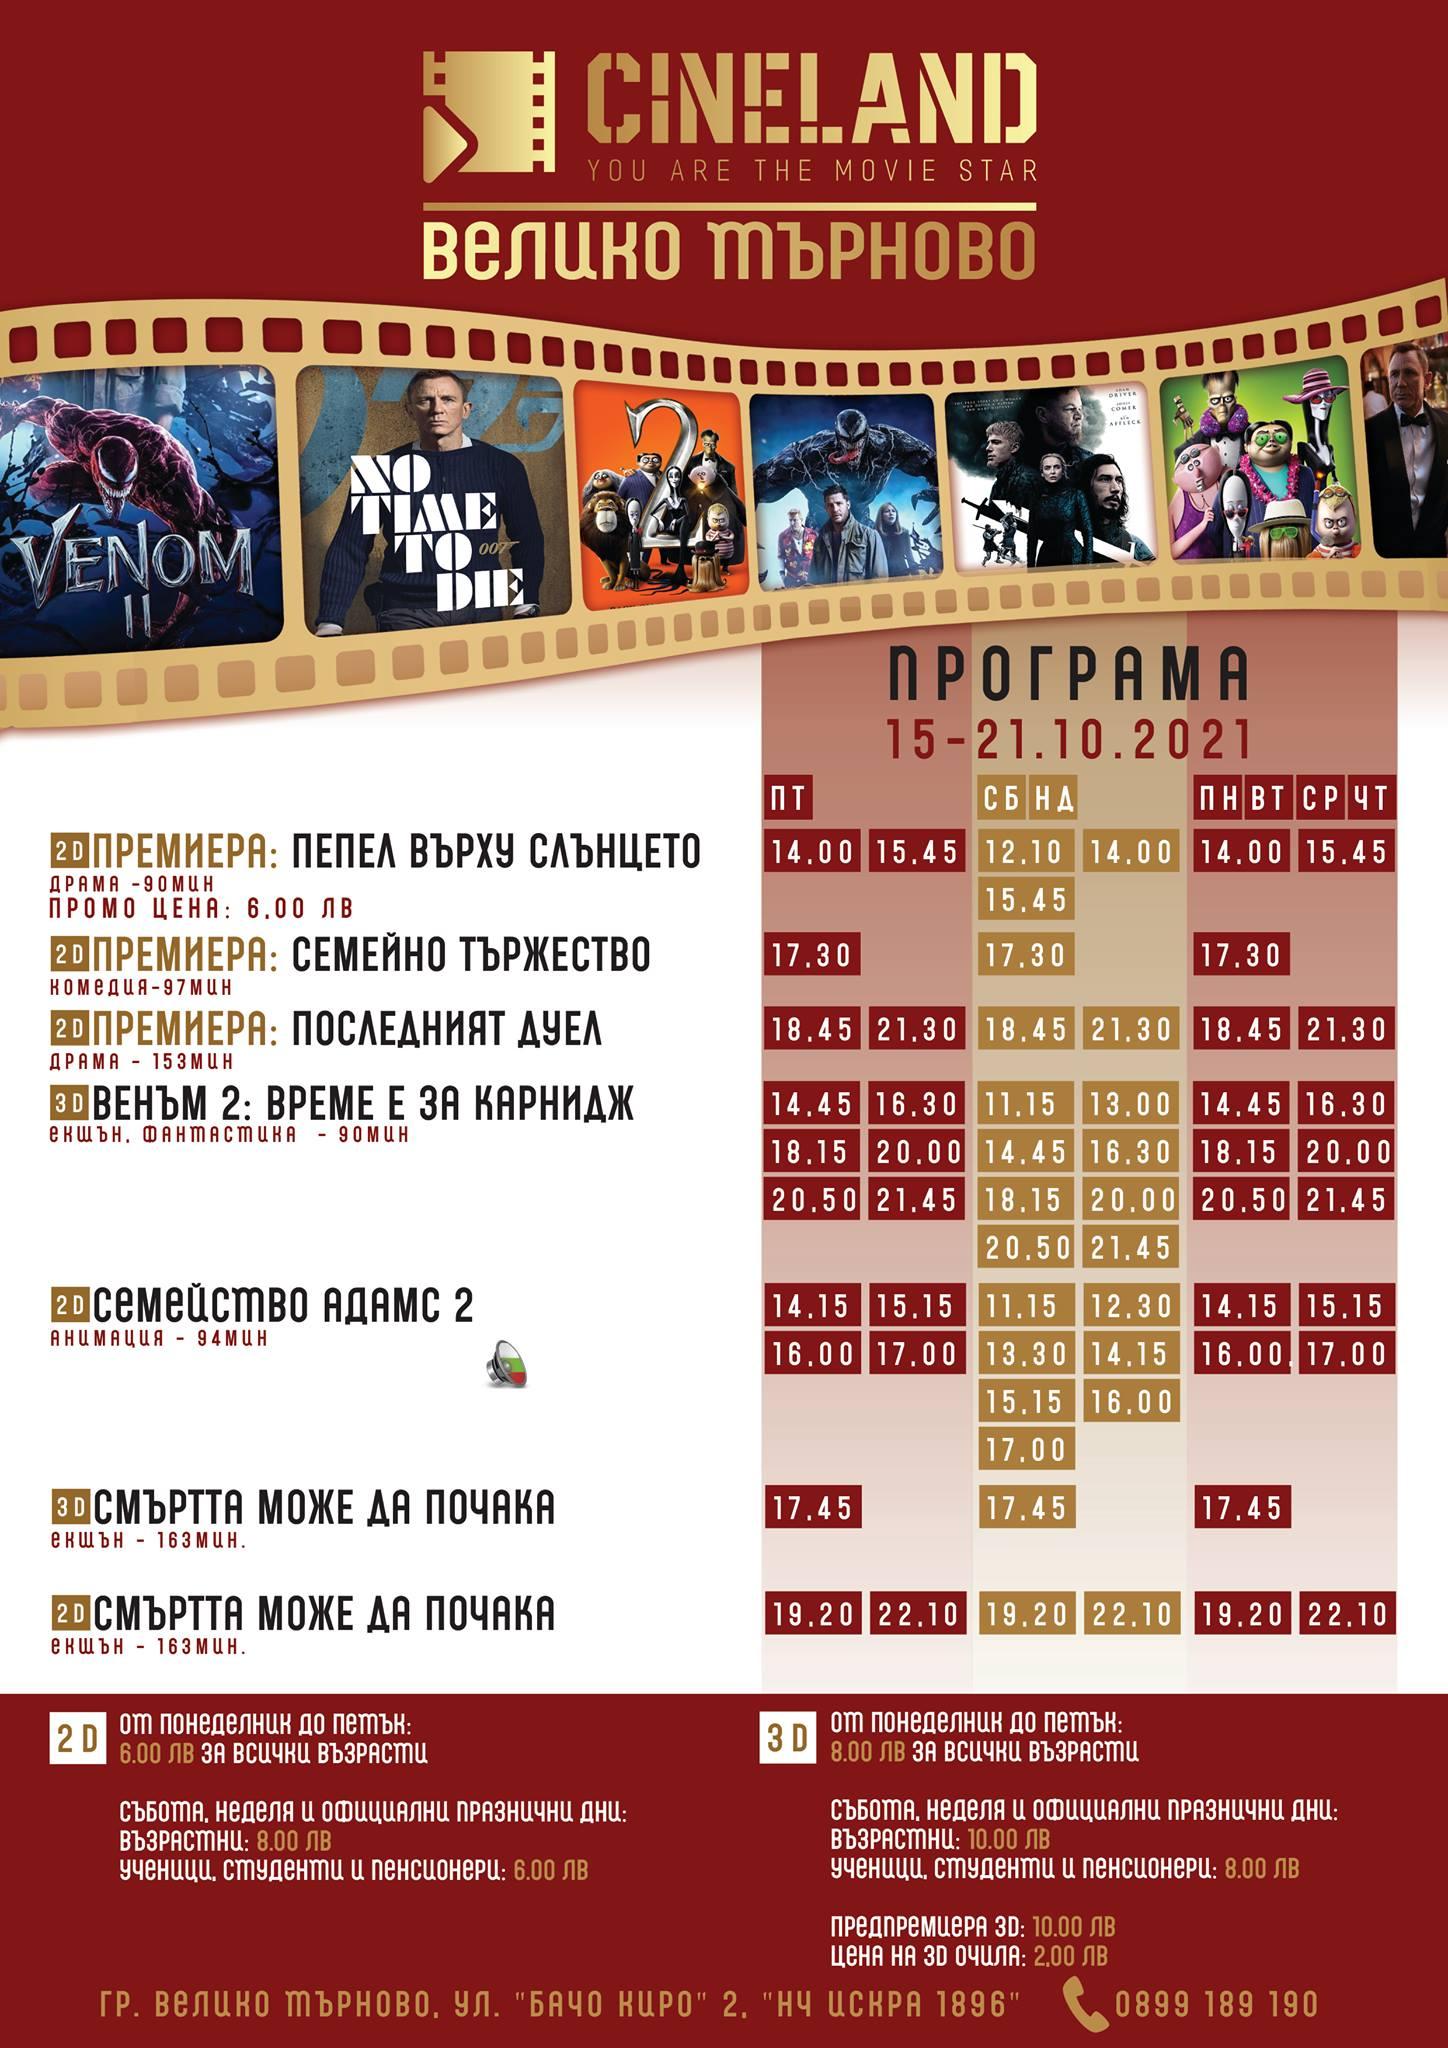 CineLand Искра Велико Търново: Кино програма - 15-21 октомври 2021